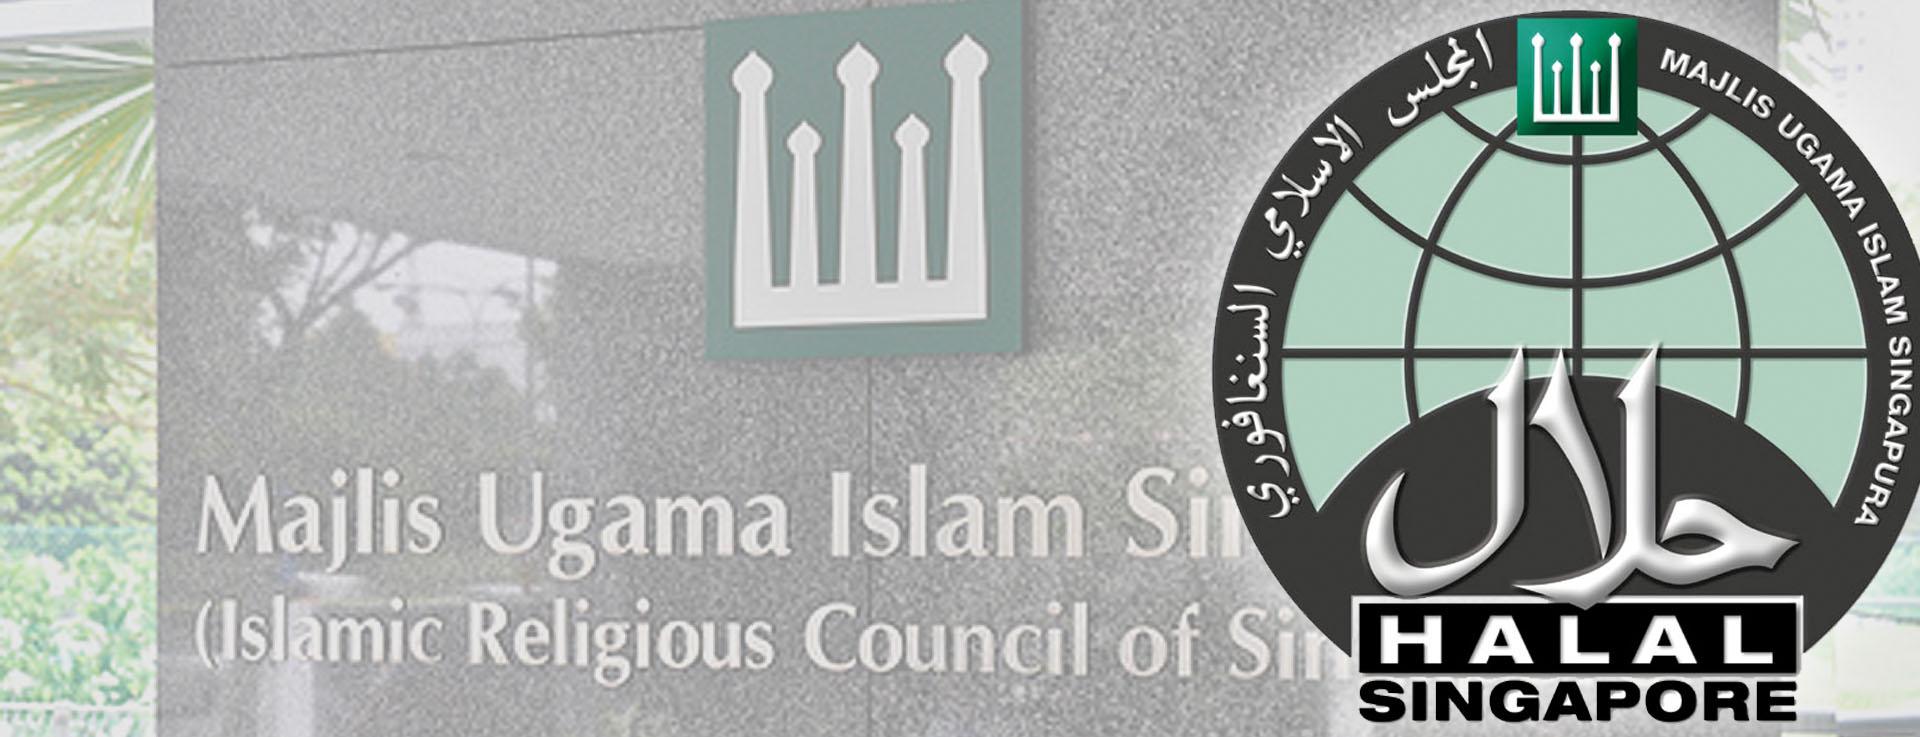 SINGAPURA MAJLIS UGAMA ISLAM (MUIS)